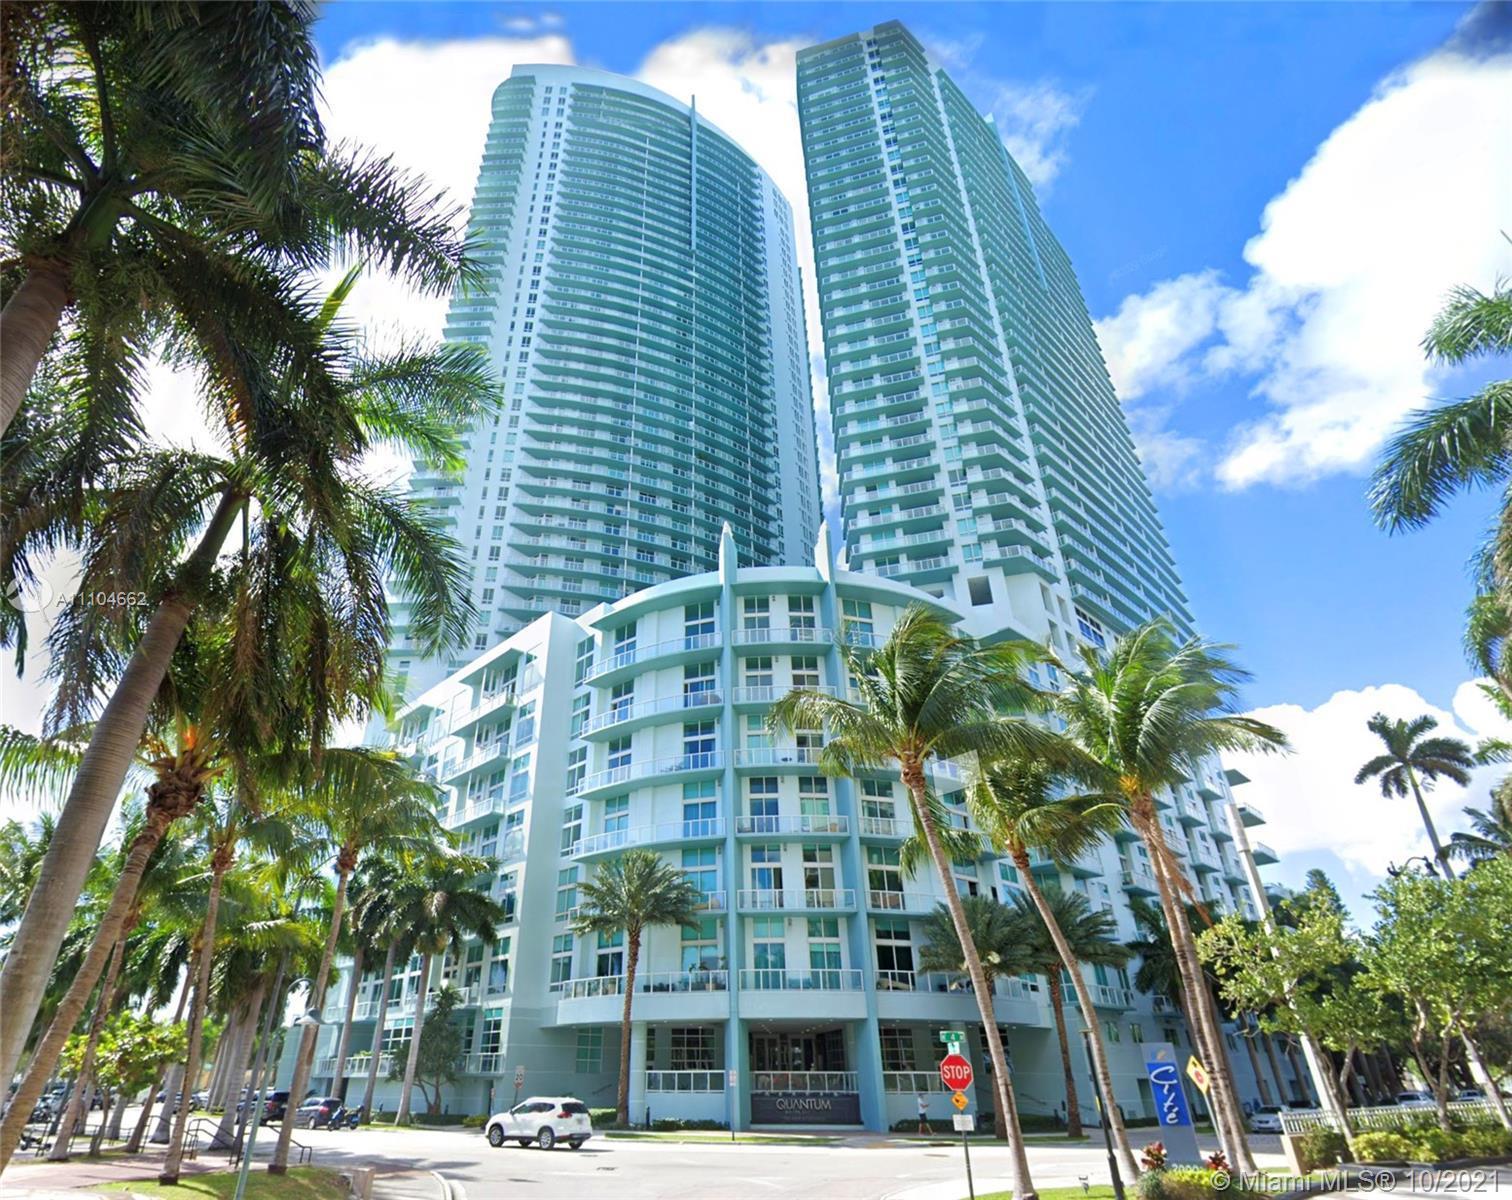 Spacious 37th floor corner unit with extensive views to the City of Miami.  2 bdrm 2 bath, ceramic f